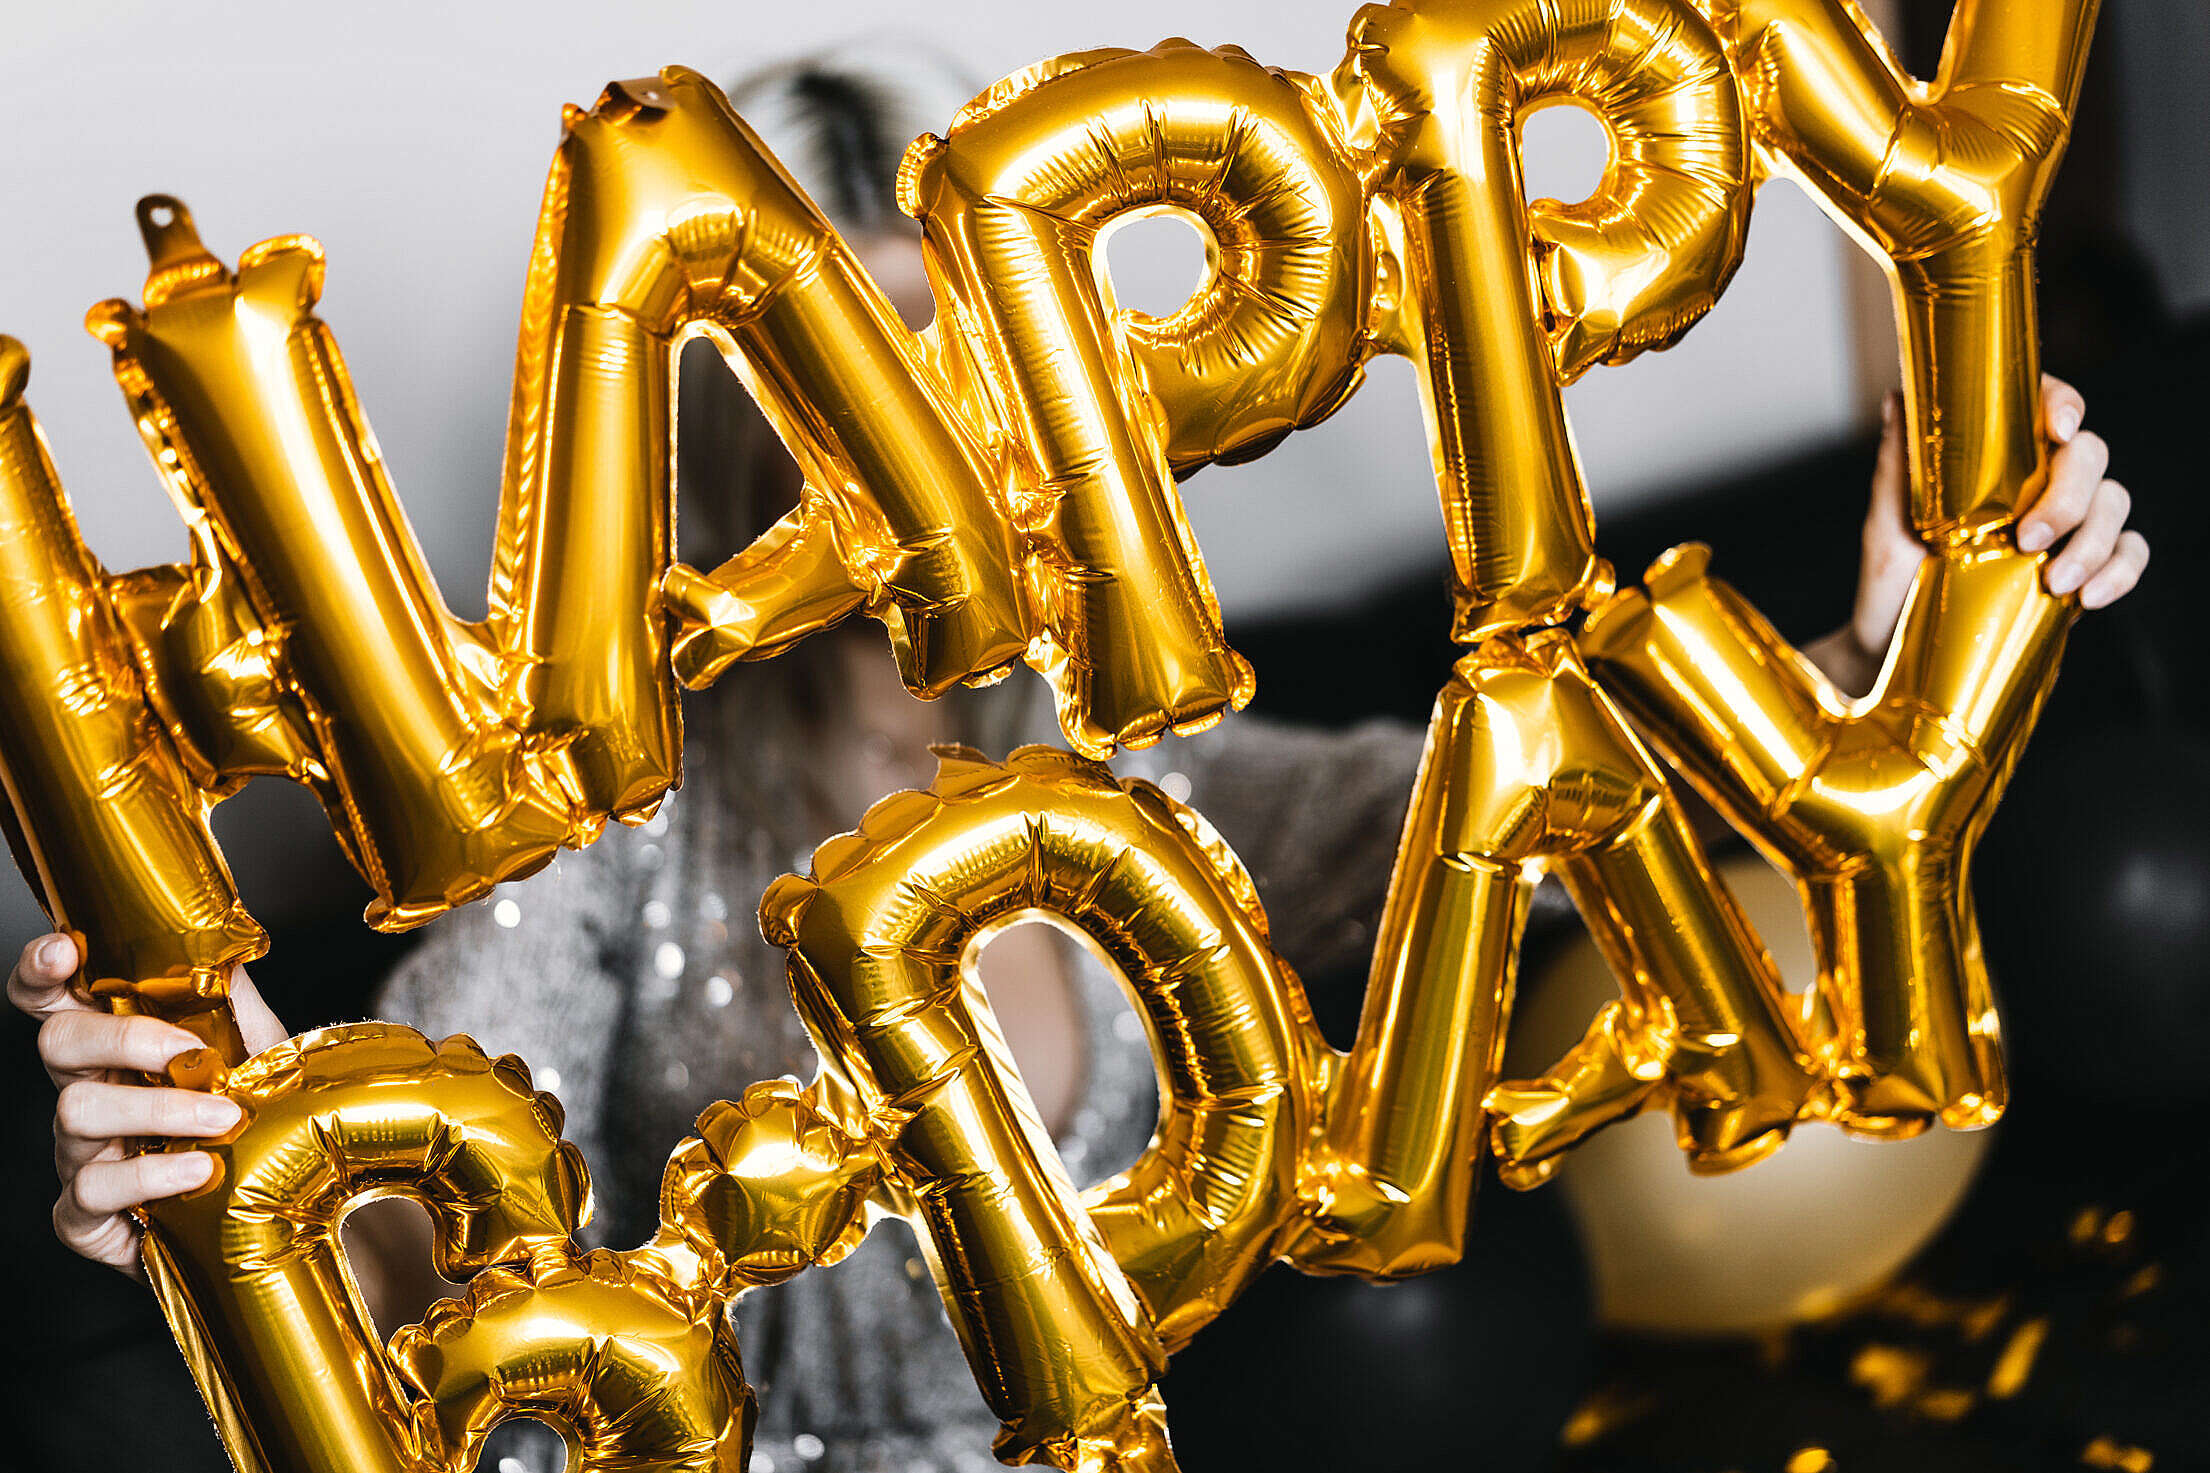 Inflatable Happy Birthday Balloons Free Stock Photo